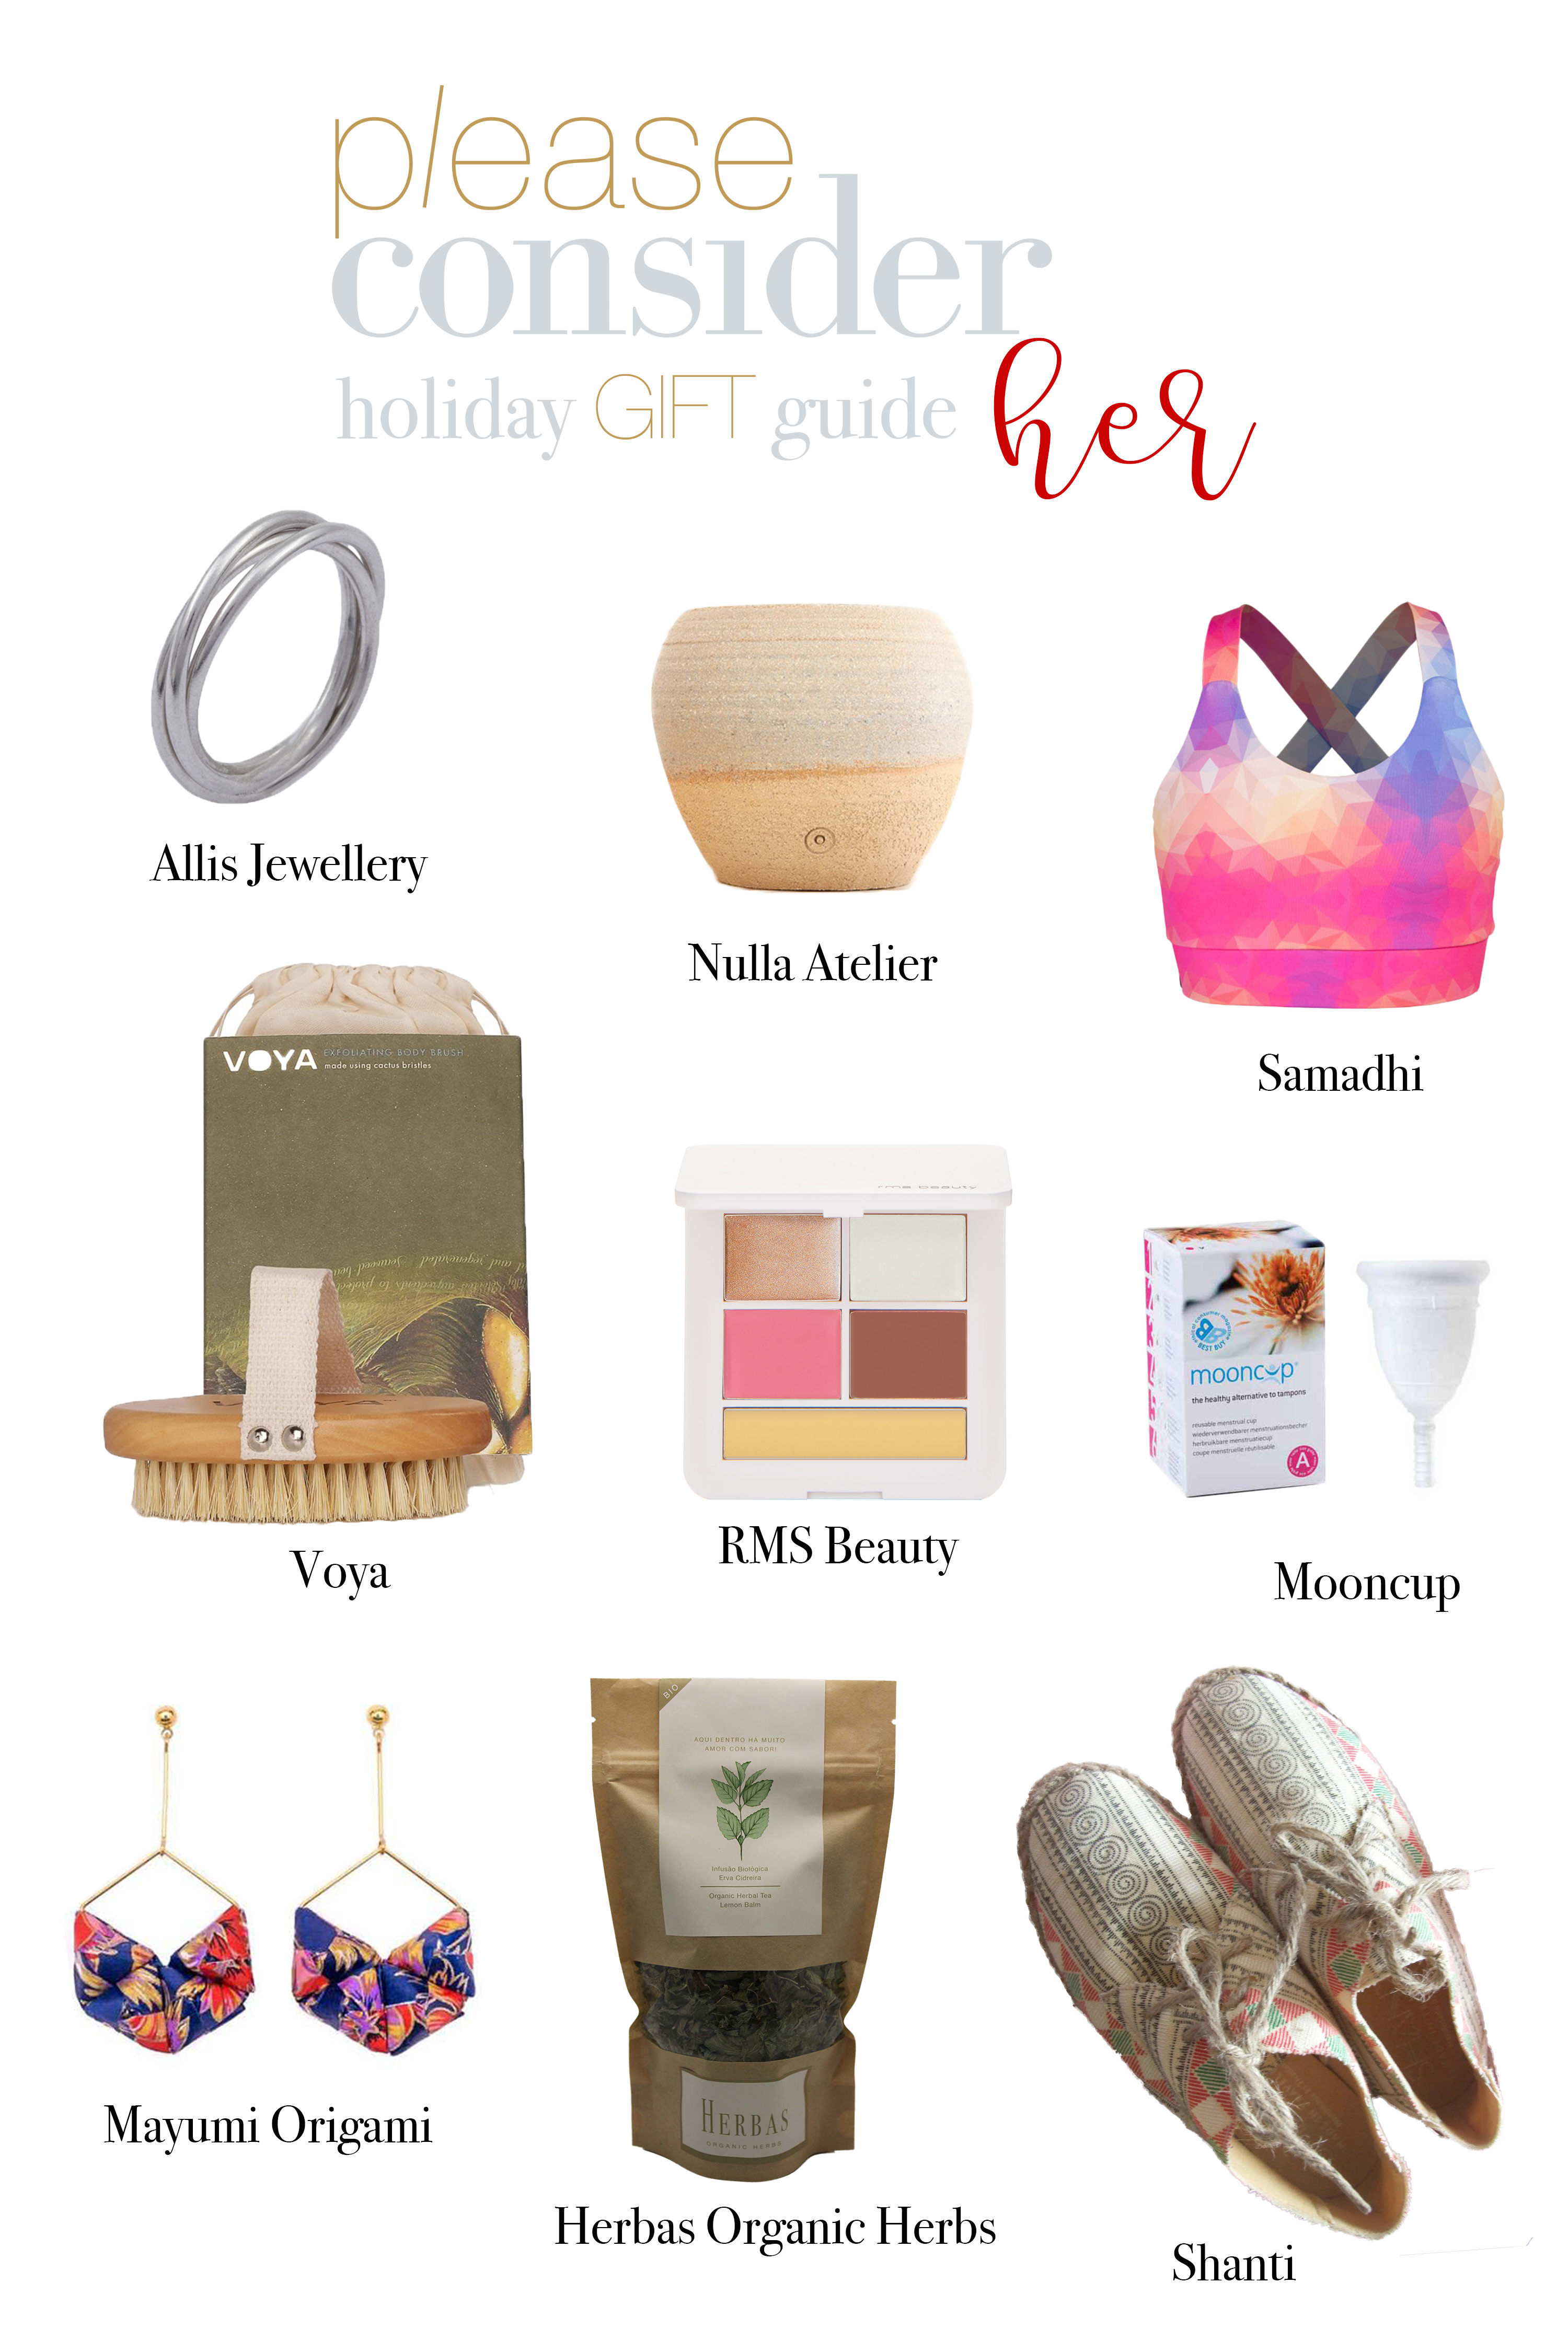 holiday gift guide   please consider   joana limao